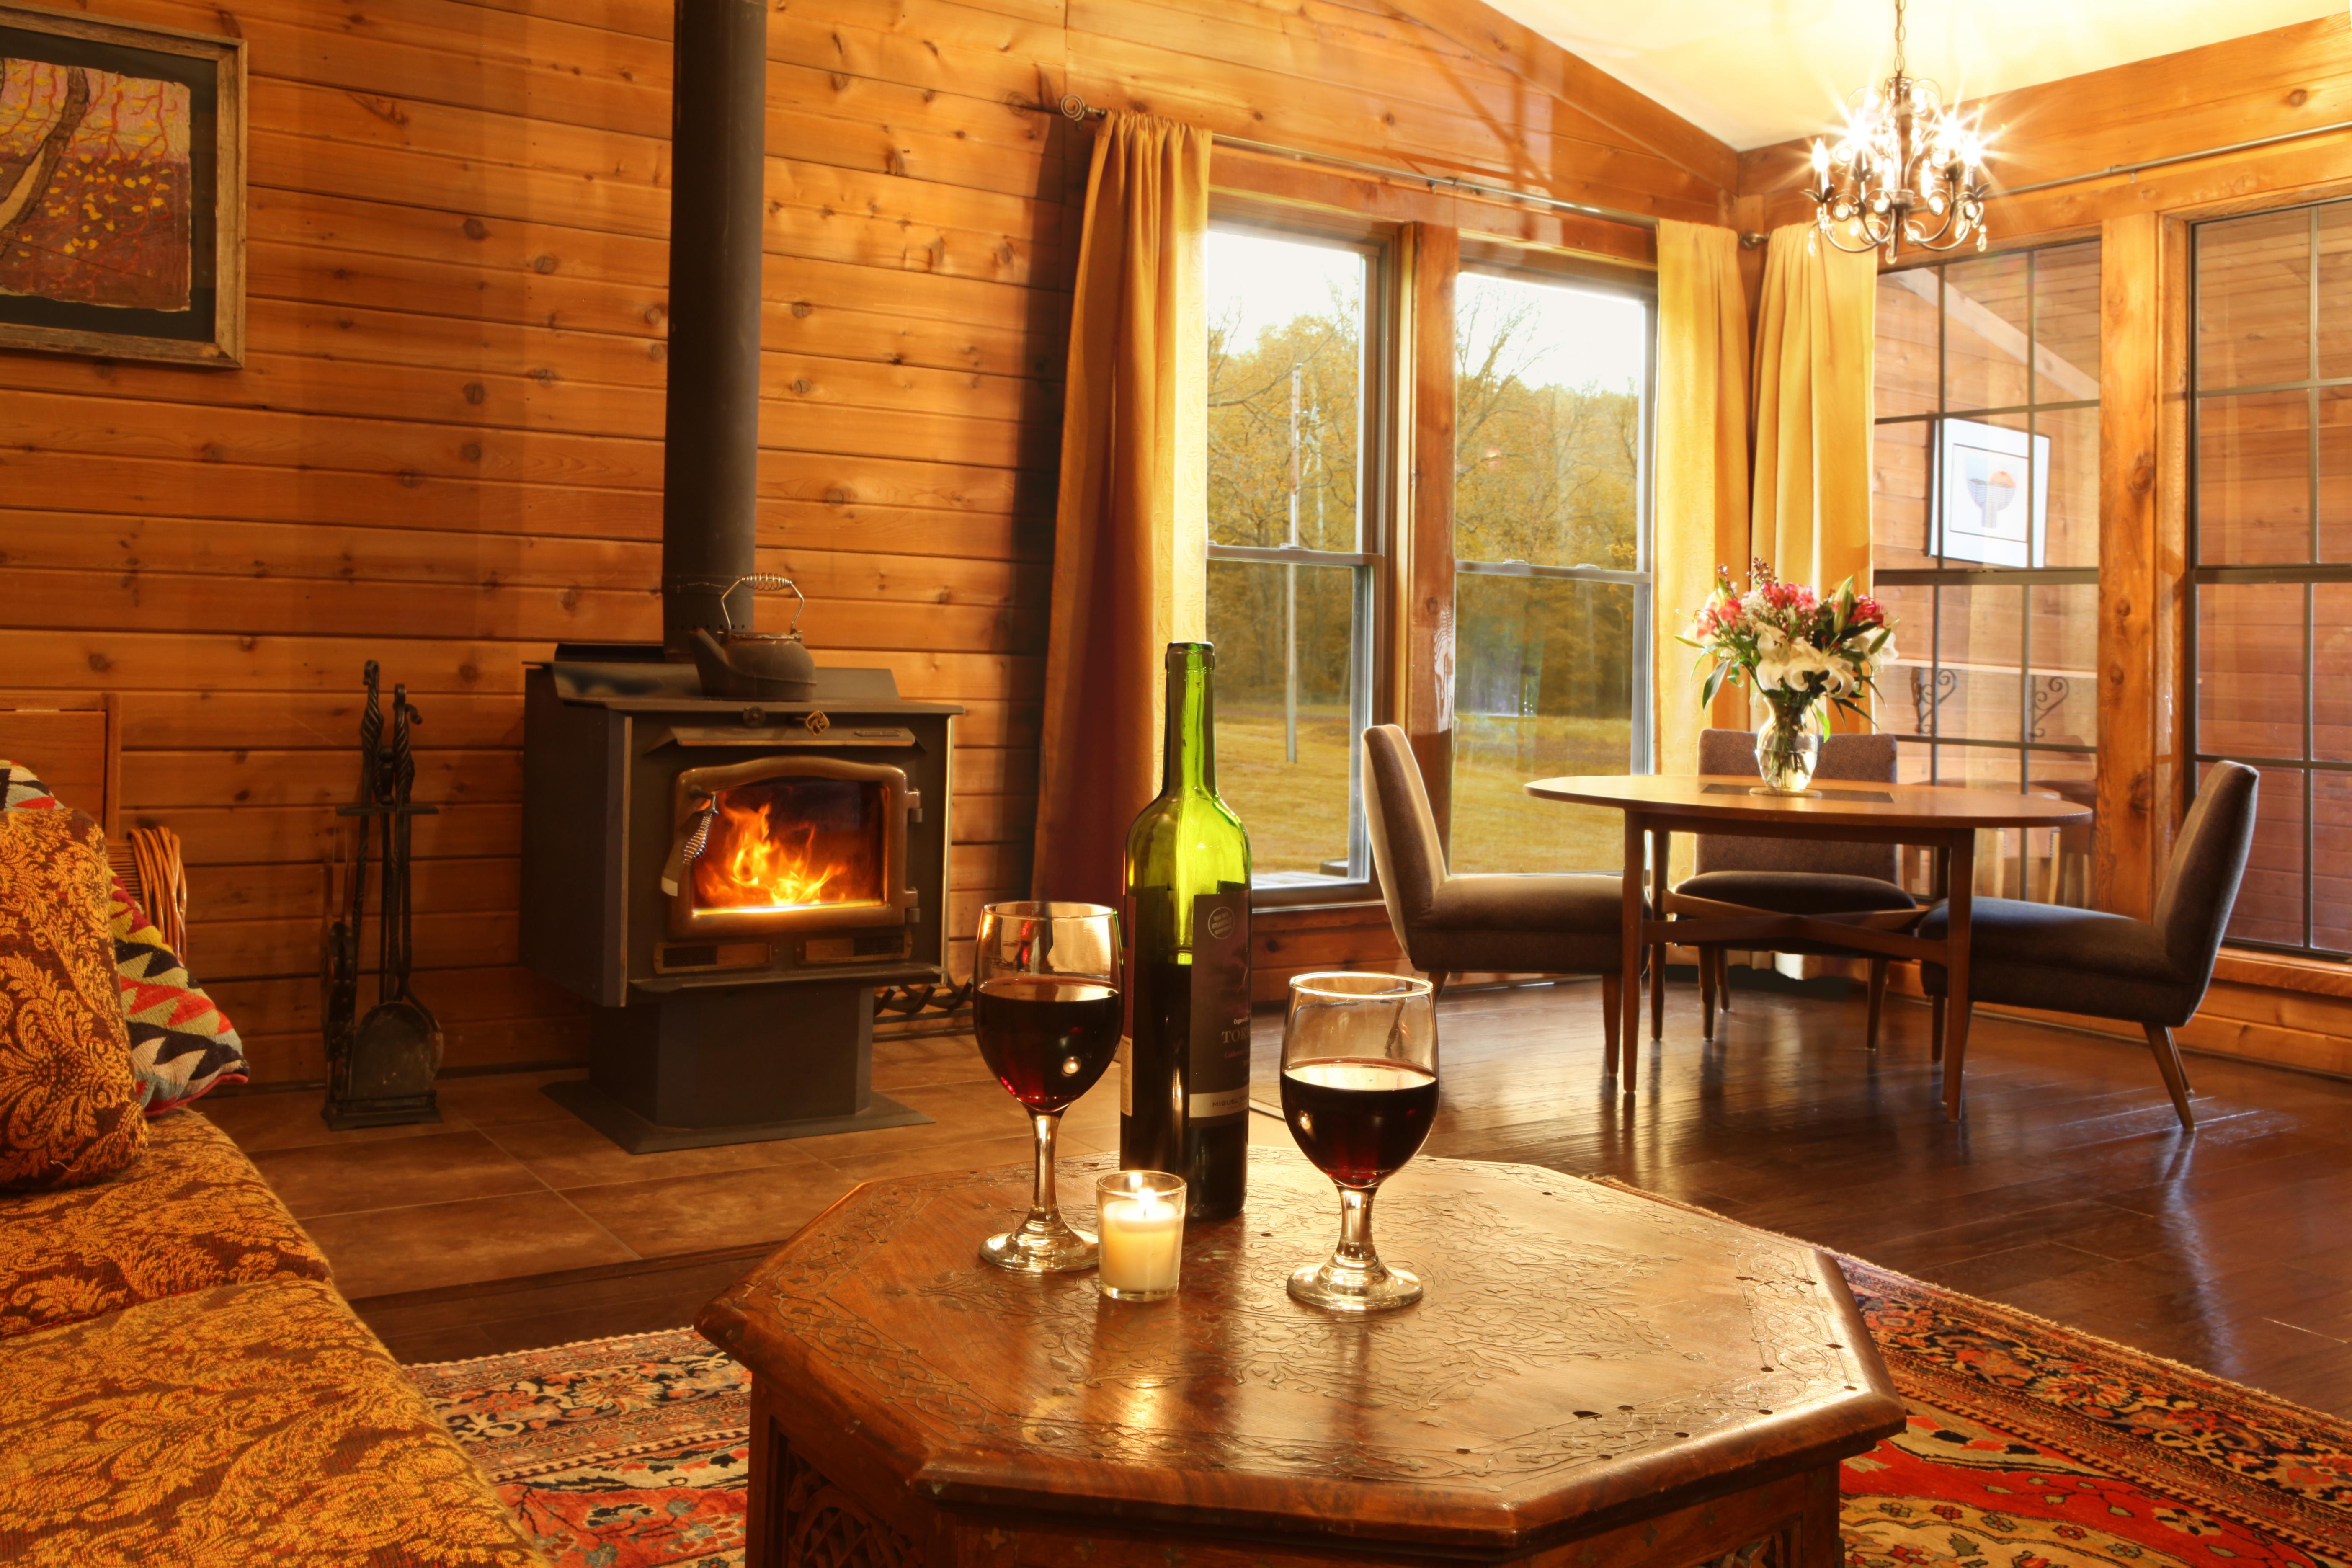 cornerstone cabins enjoy illinois images cornerstone cabins cornerstone cabins